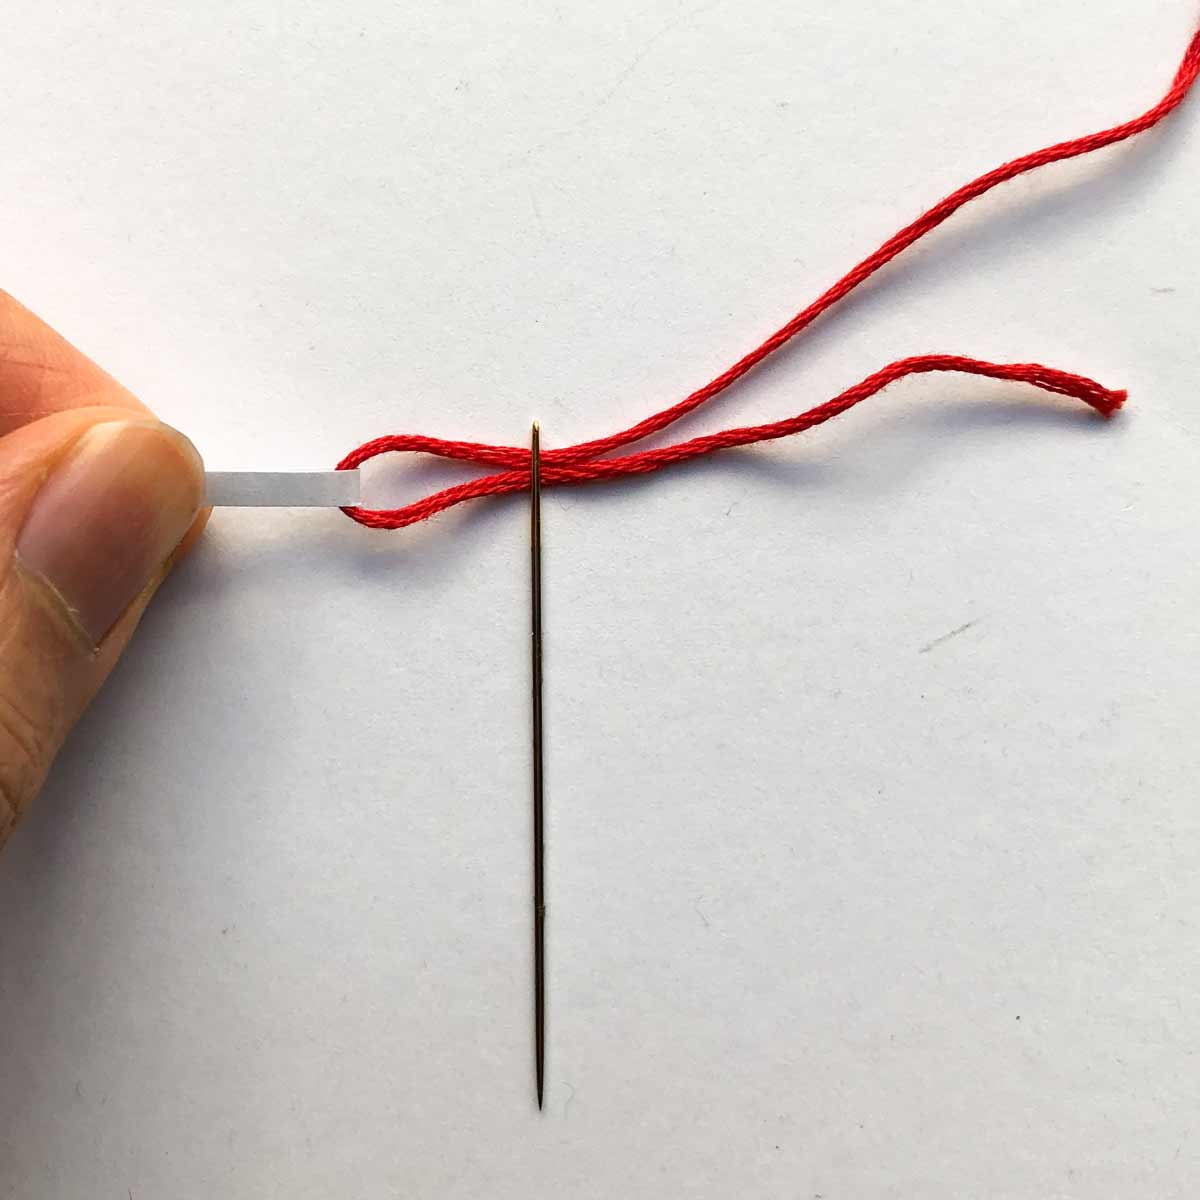 Pulling thread through eye of needle